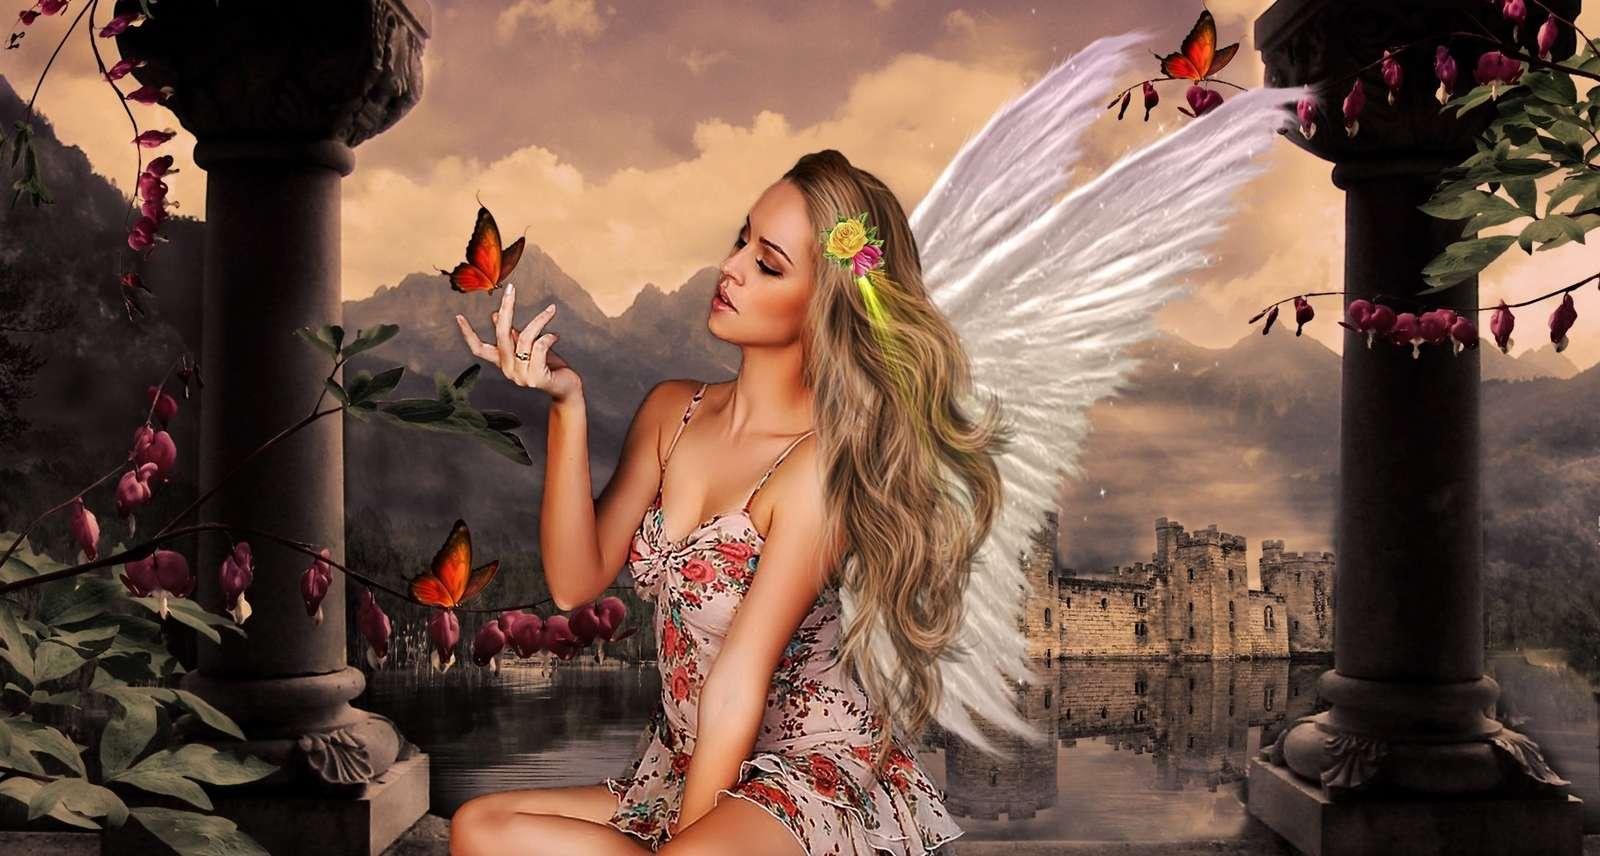 Fata-înger